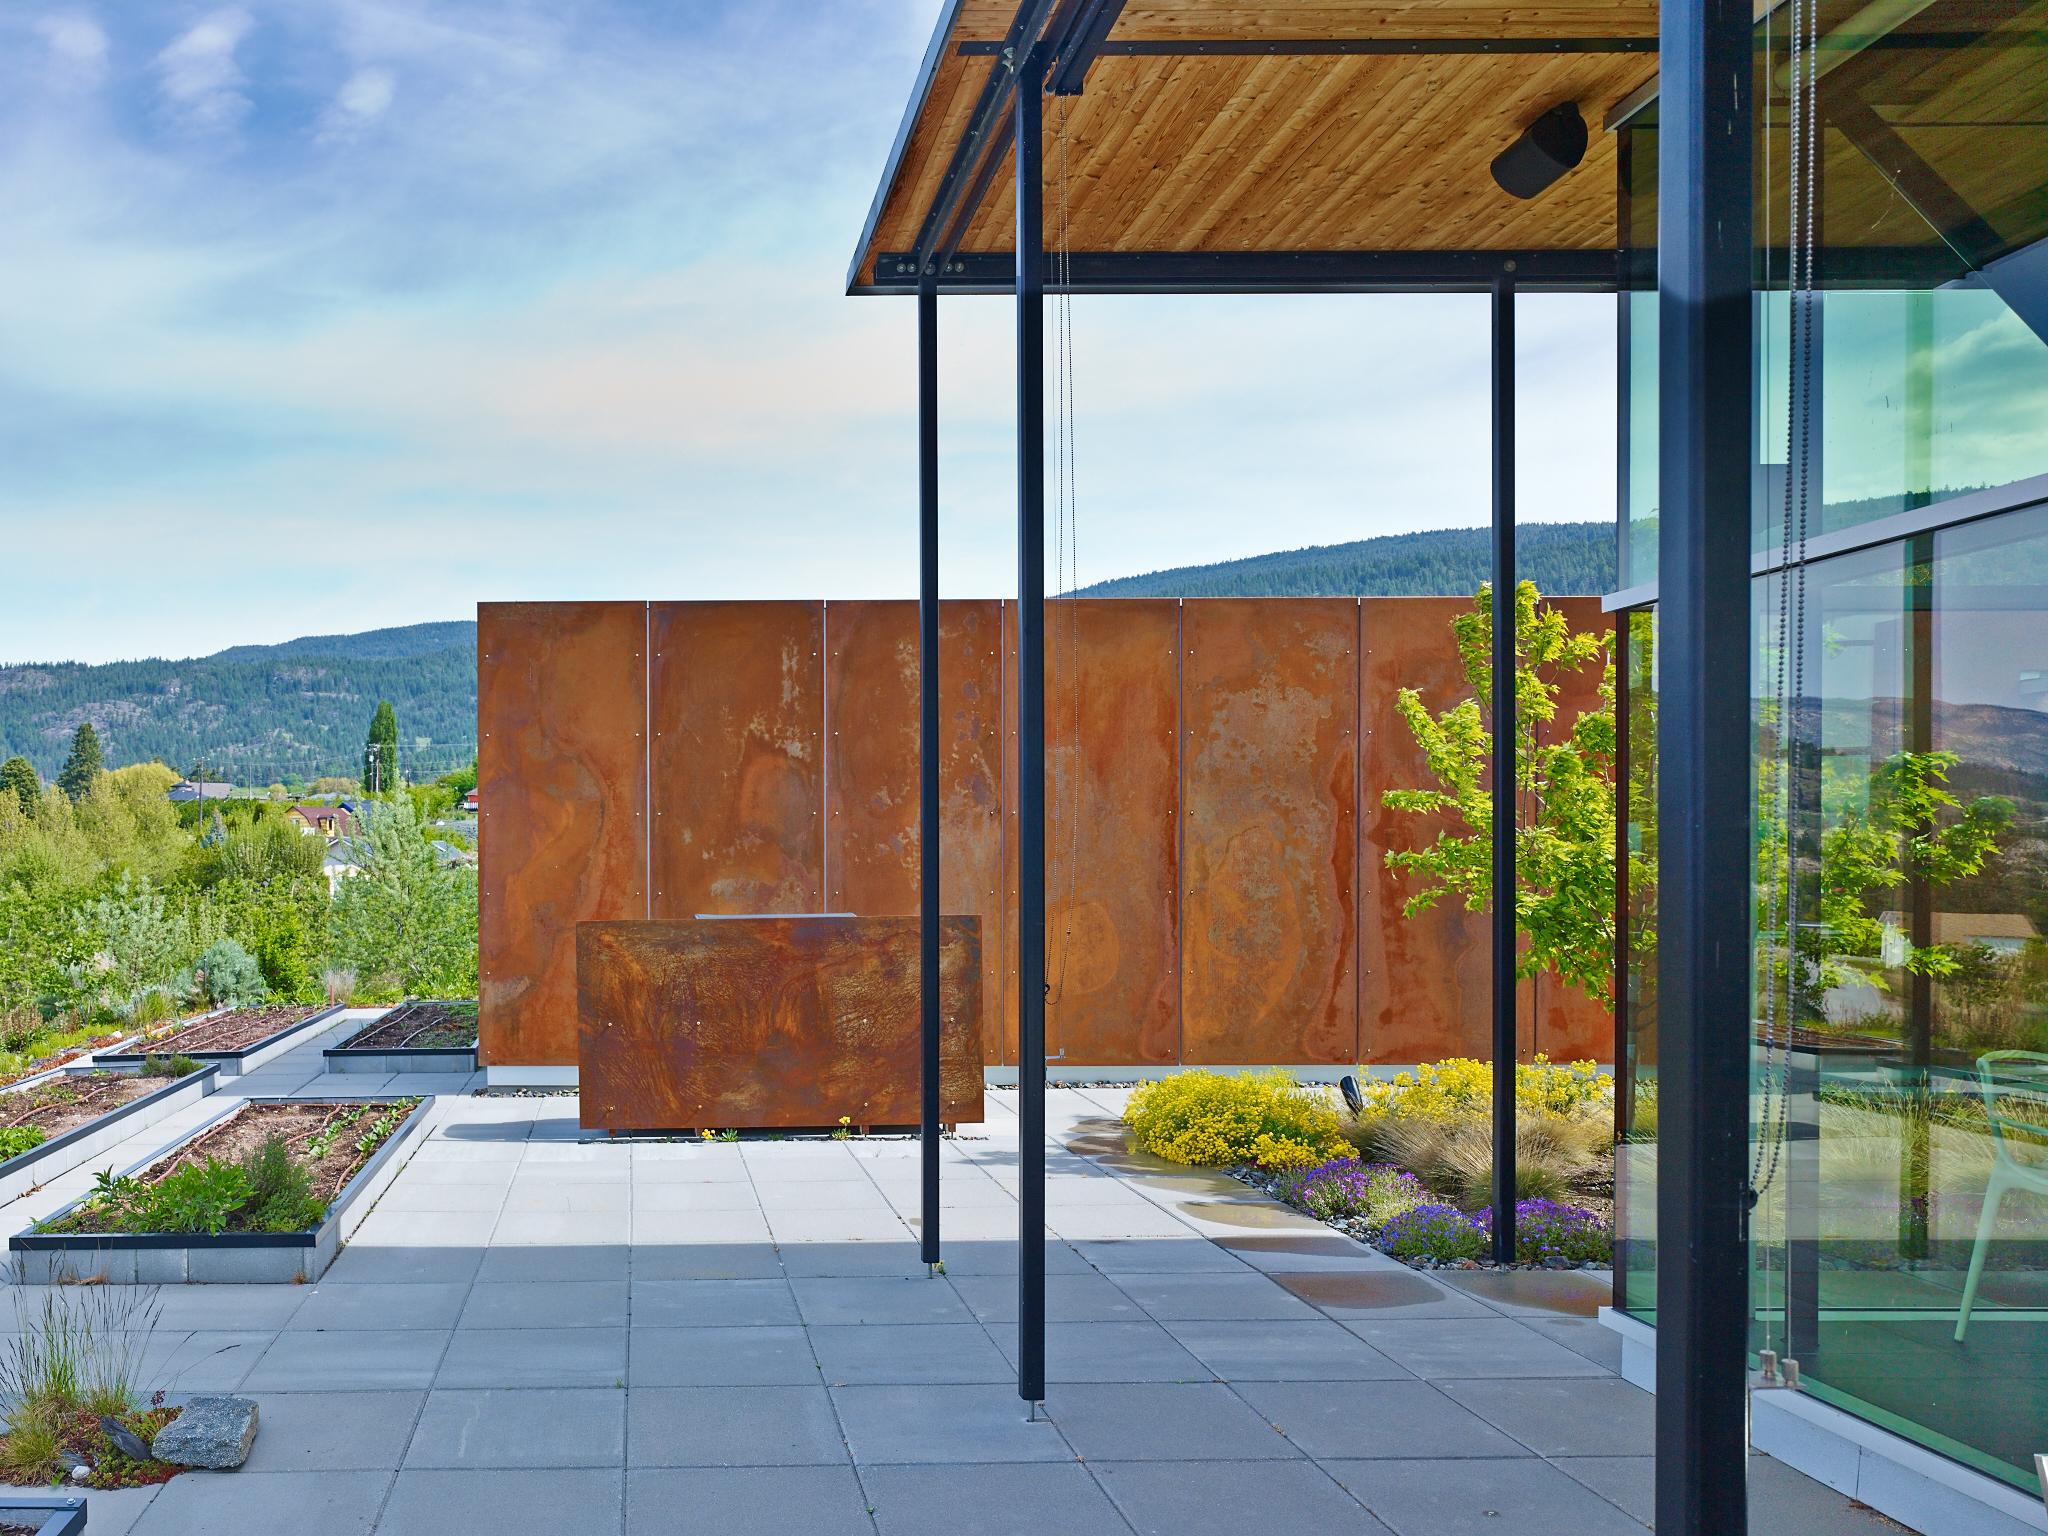 Sloan-Berkes Residence